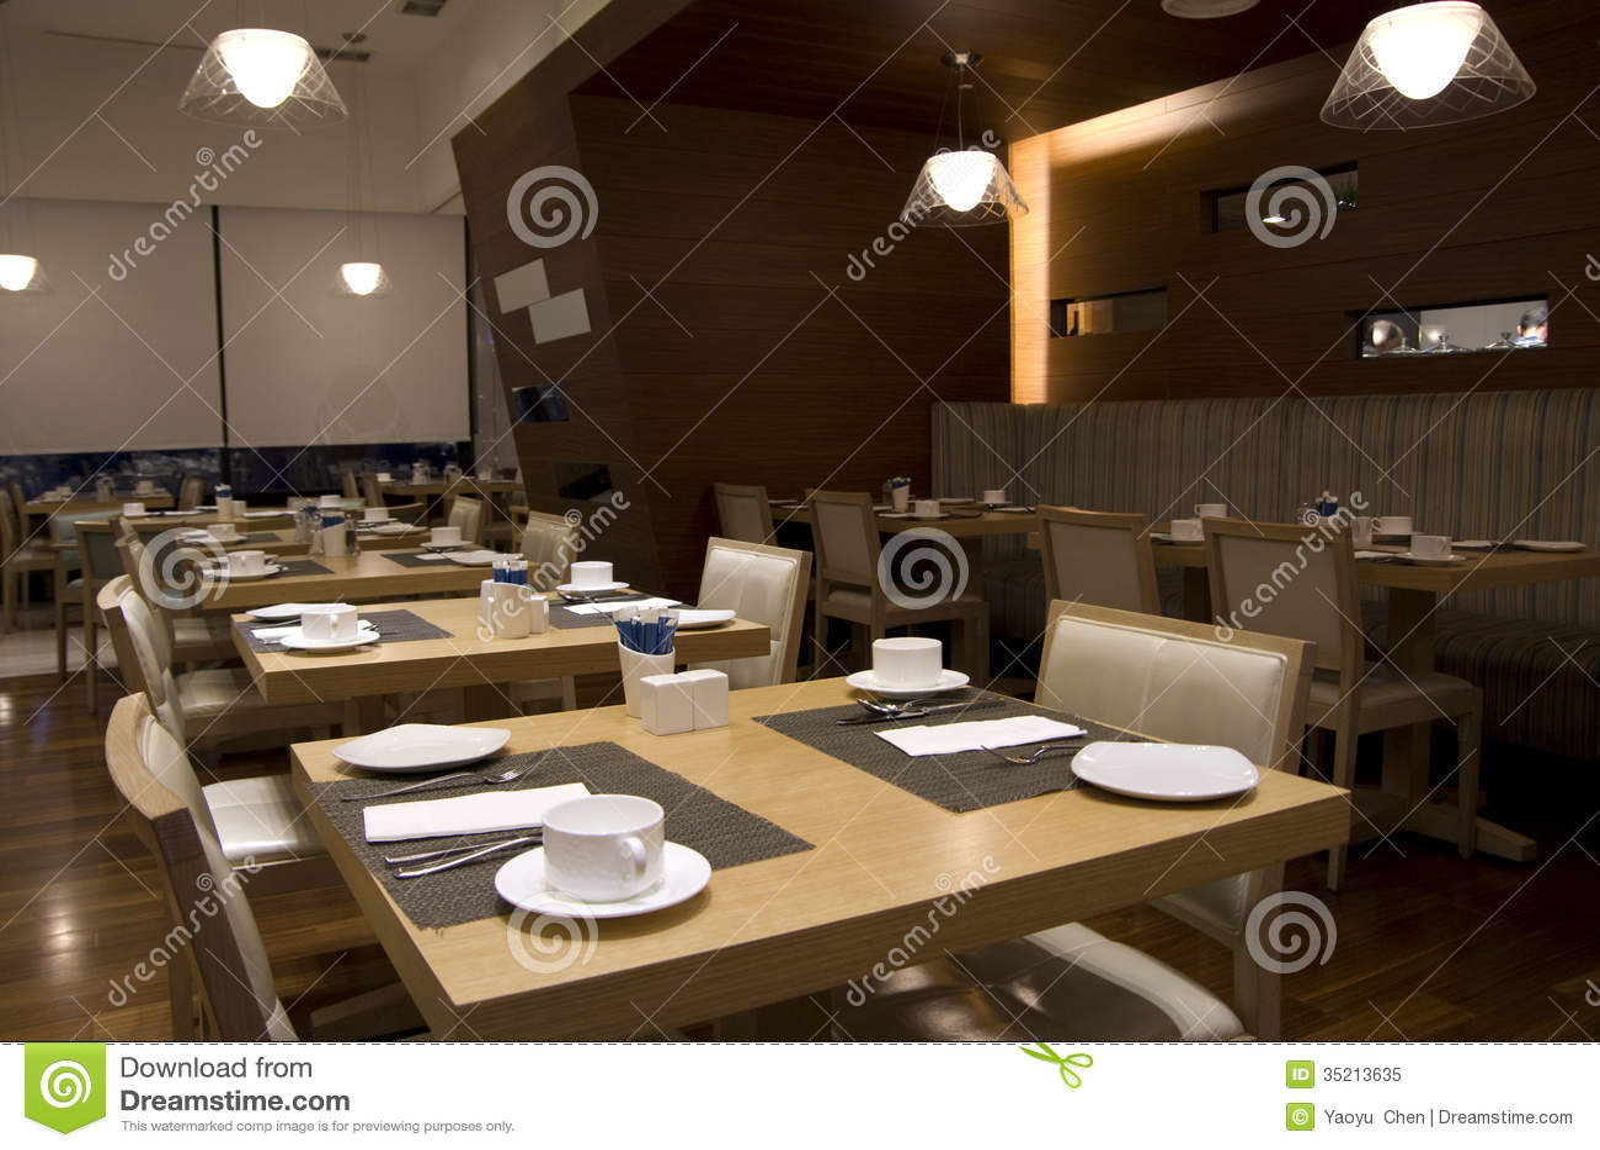 Breakfast Buffet Restaurant Interiors Royalty Free Stock